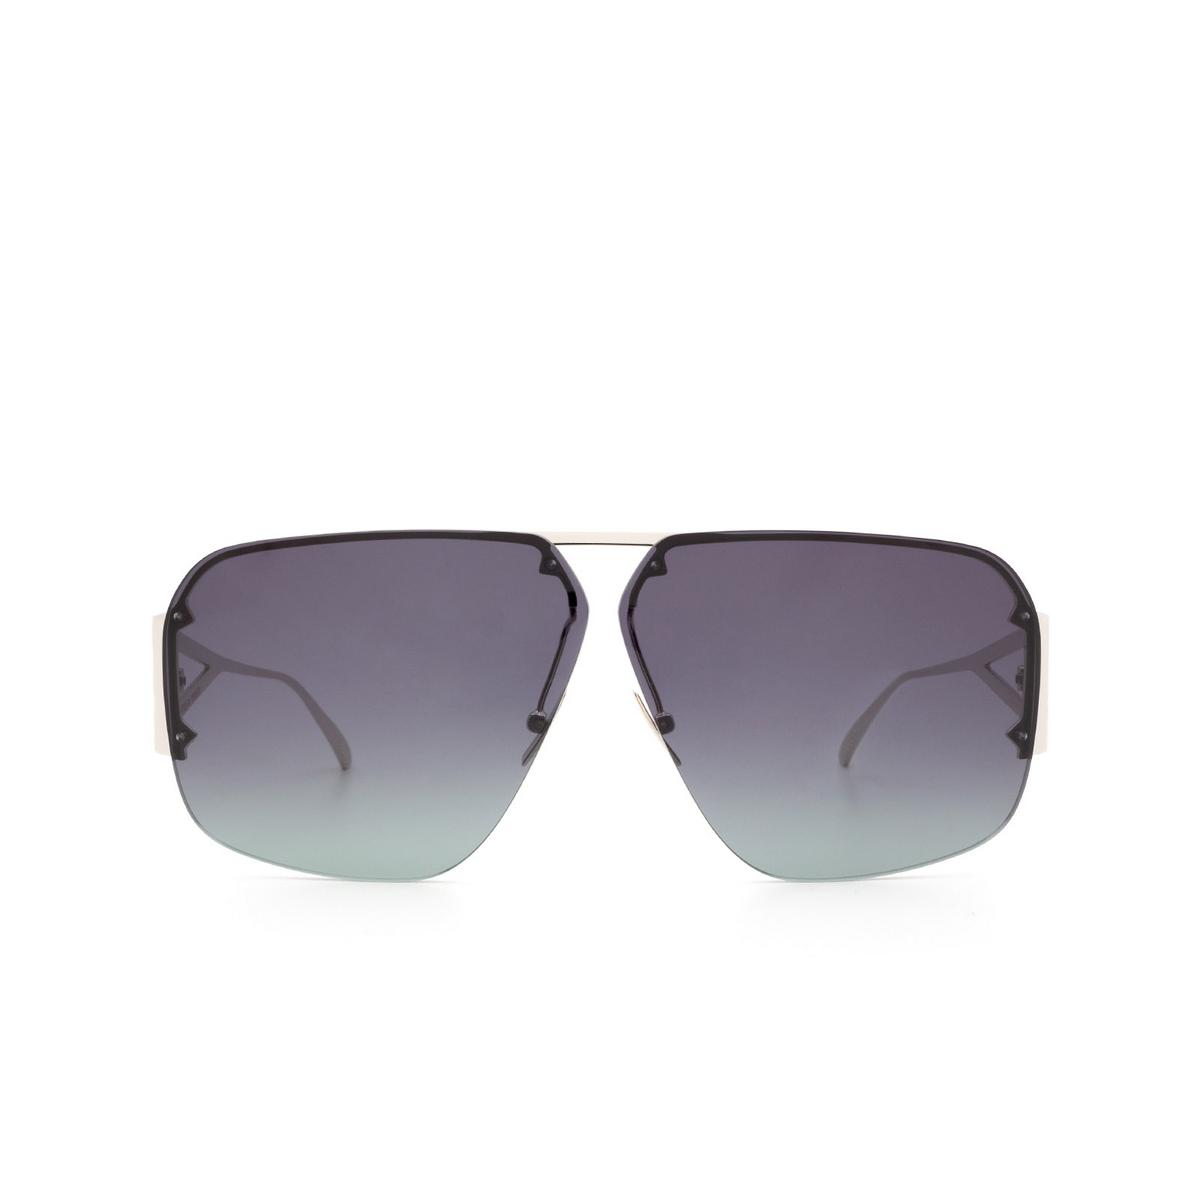 Bottega Veneta® Square Sunglasses: BV1065S color Silver 001 - front view.